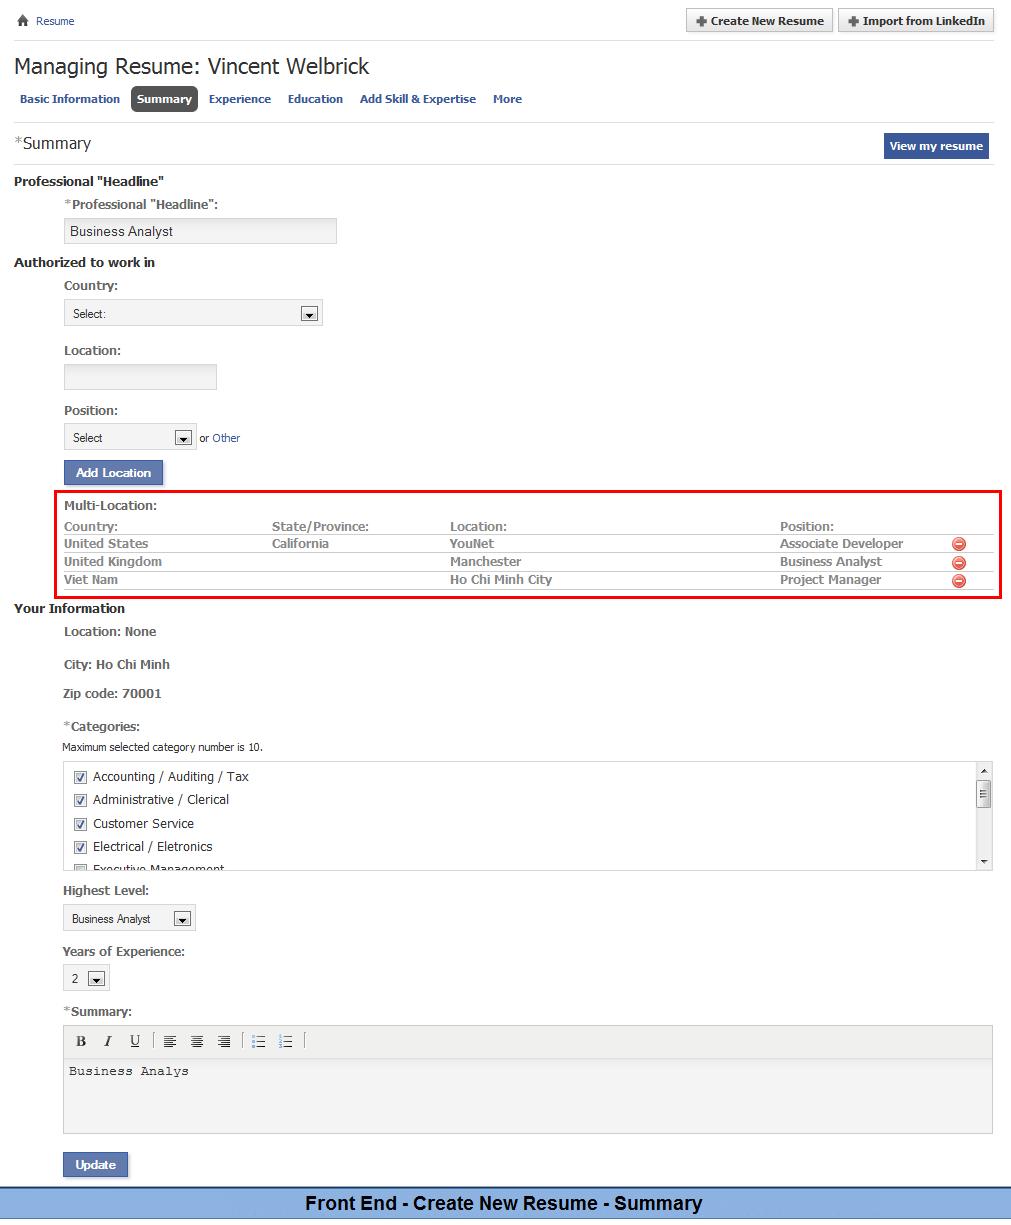 web based resume builder software bio data maker web based resume builder software online survey web form builder emailmeform resume resume builder resume builder